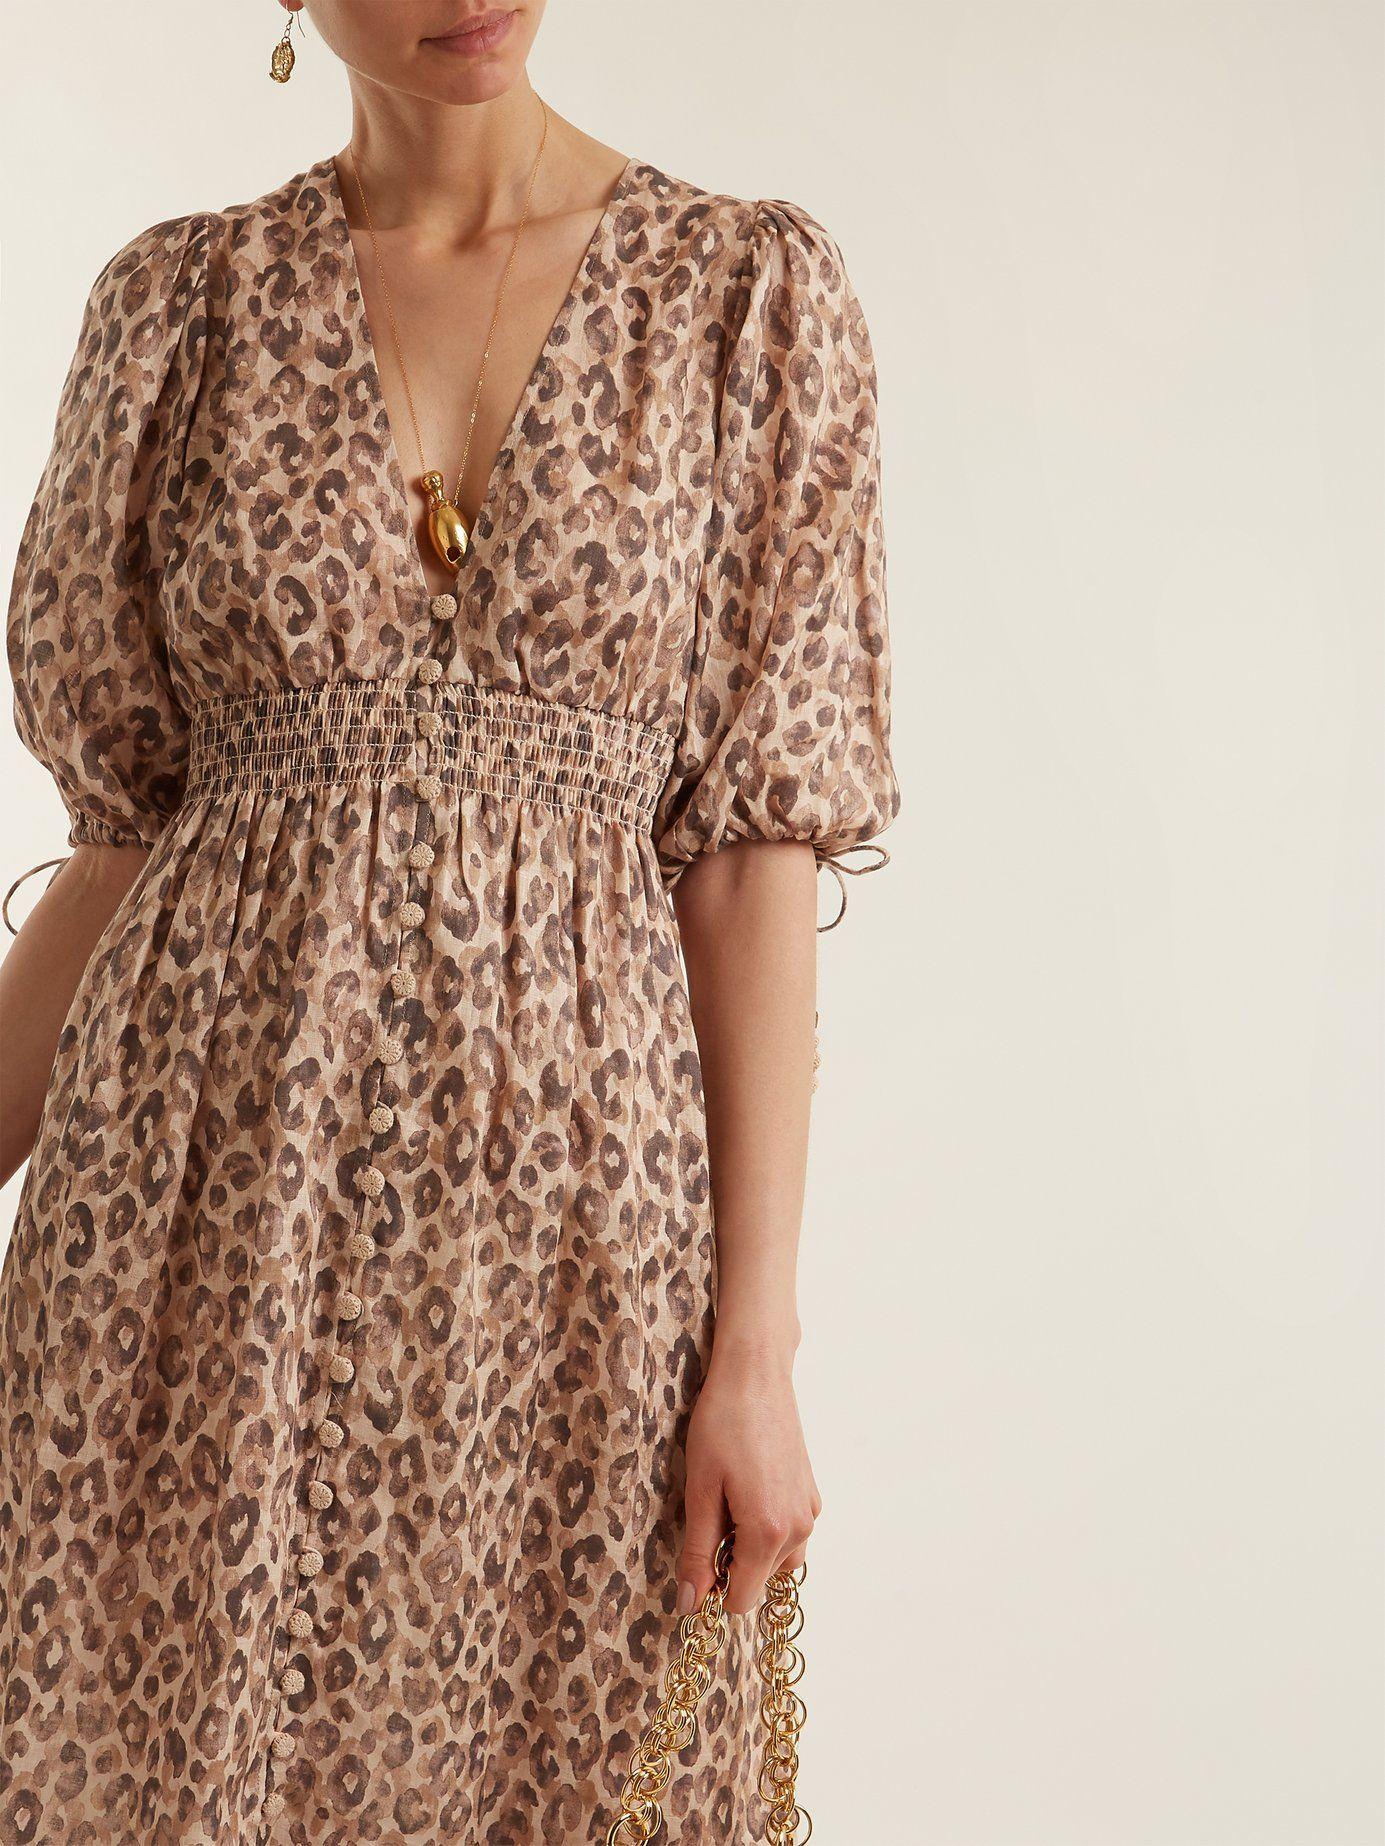 Leopard Linen DressZimmermann com Print Matchesfashion Melody ymvnNP8wO0